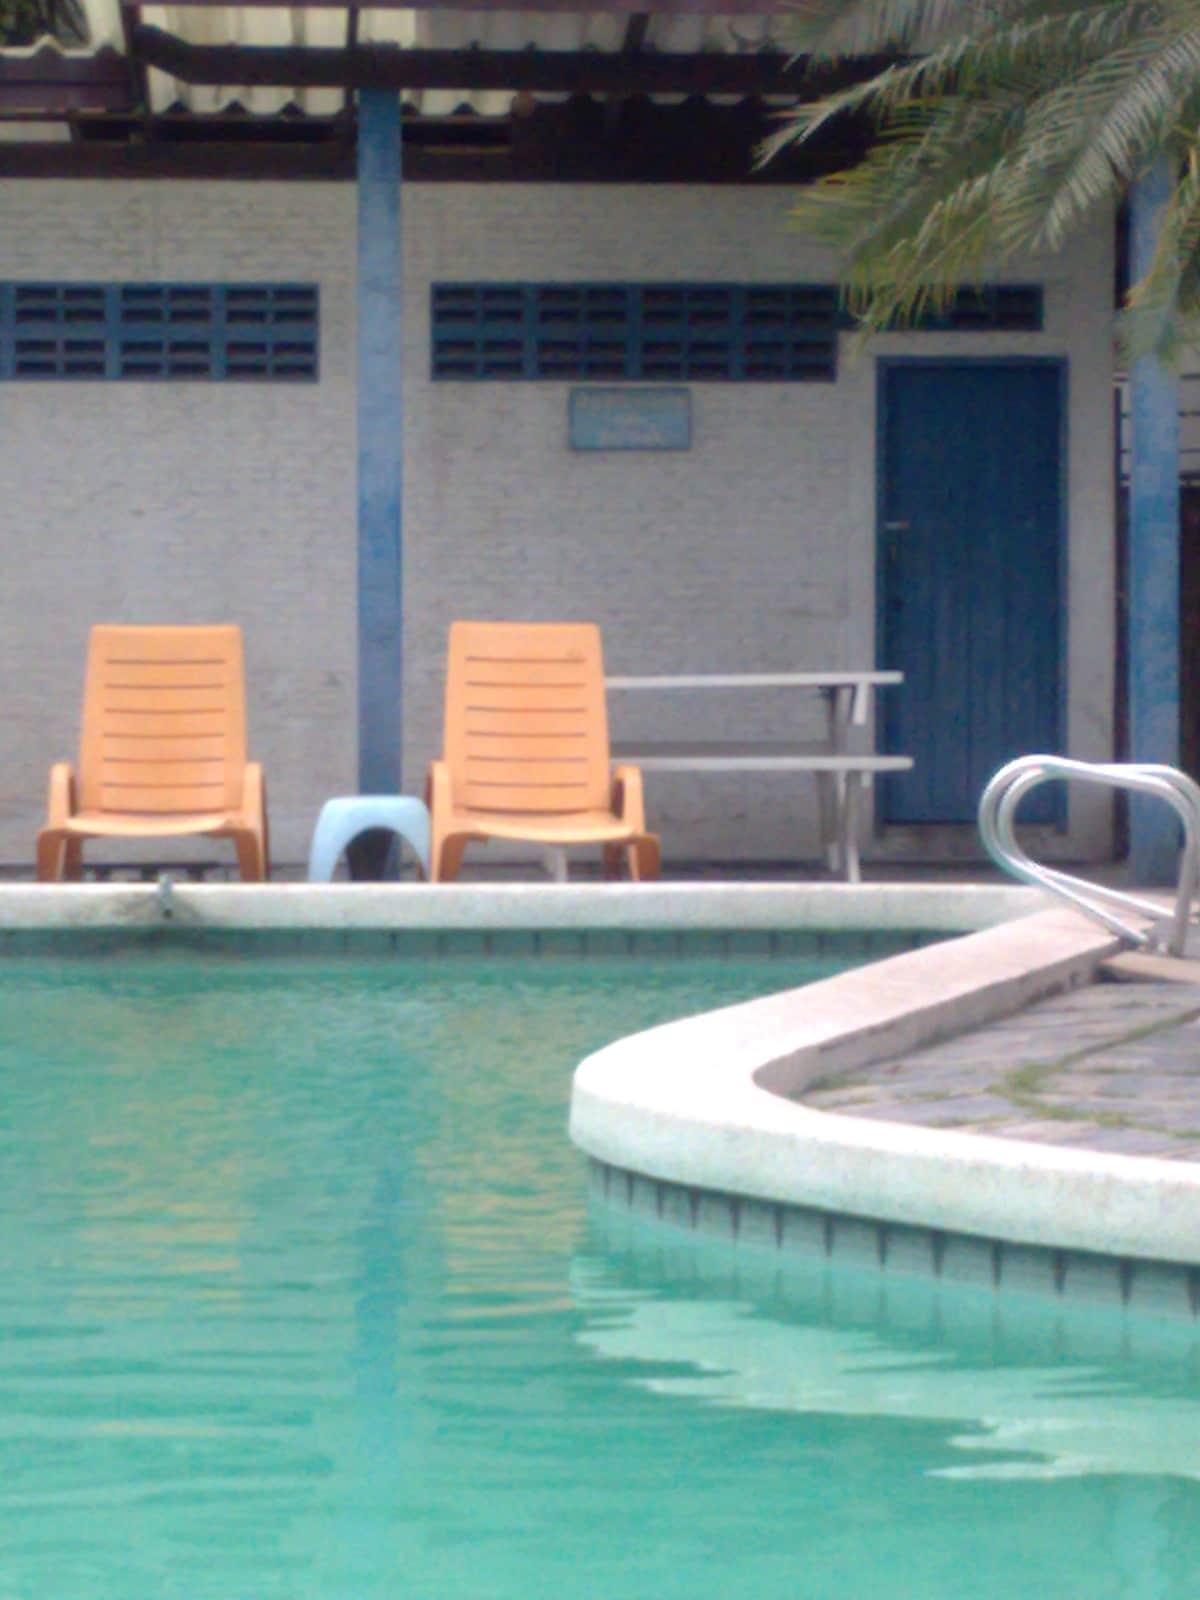 Free-form swimming pool-3steps away